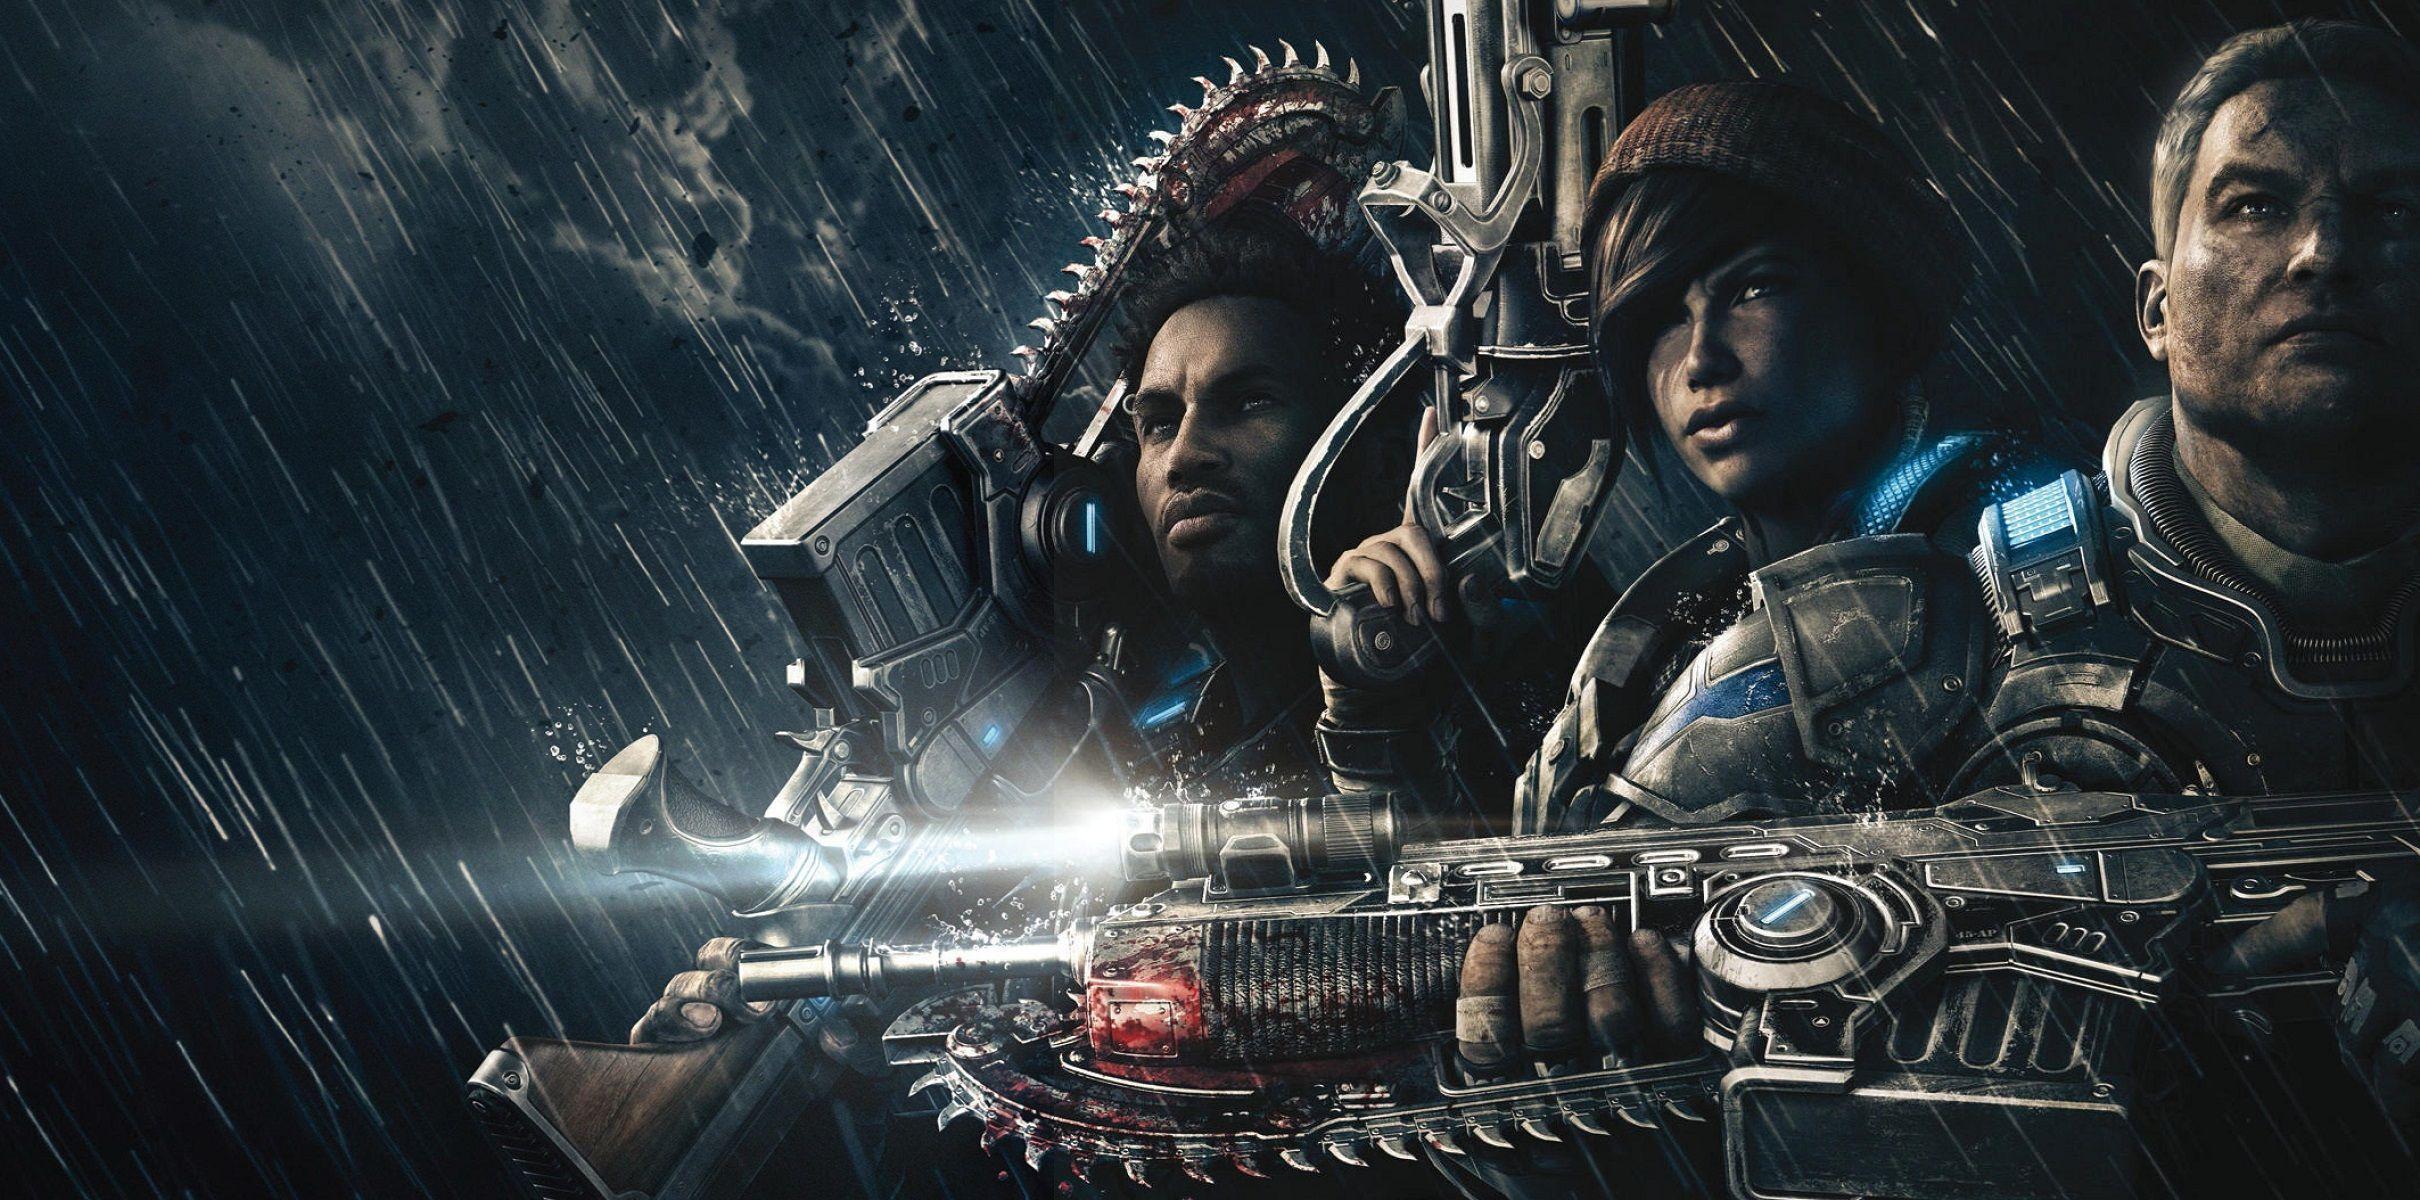 39 Gears Of War 4 HD Wallpapers | Backgrounds - Wallpaper Abyss